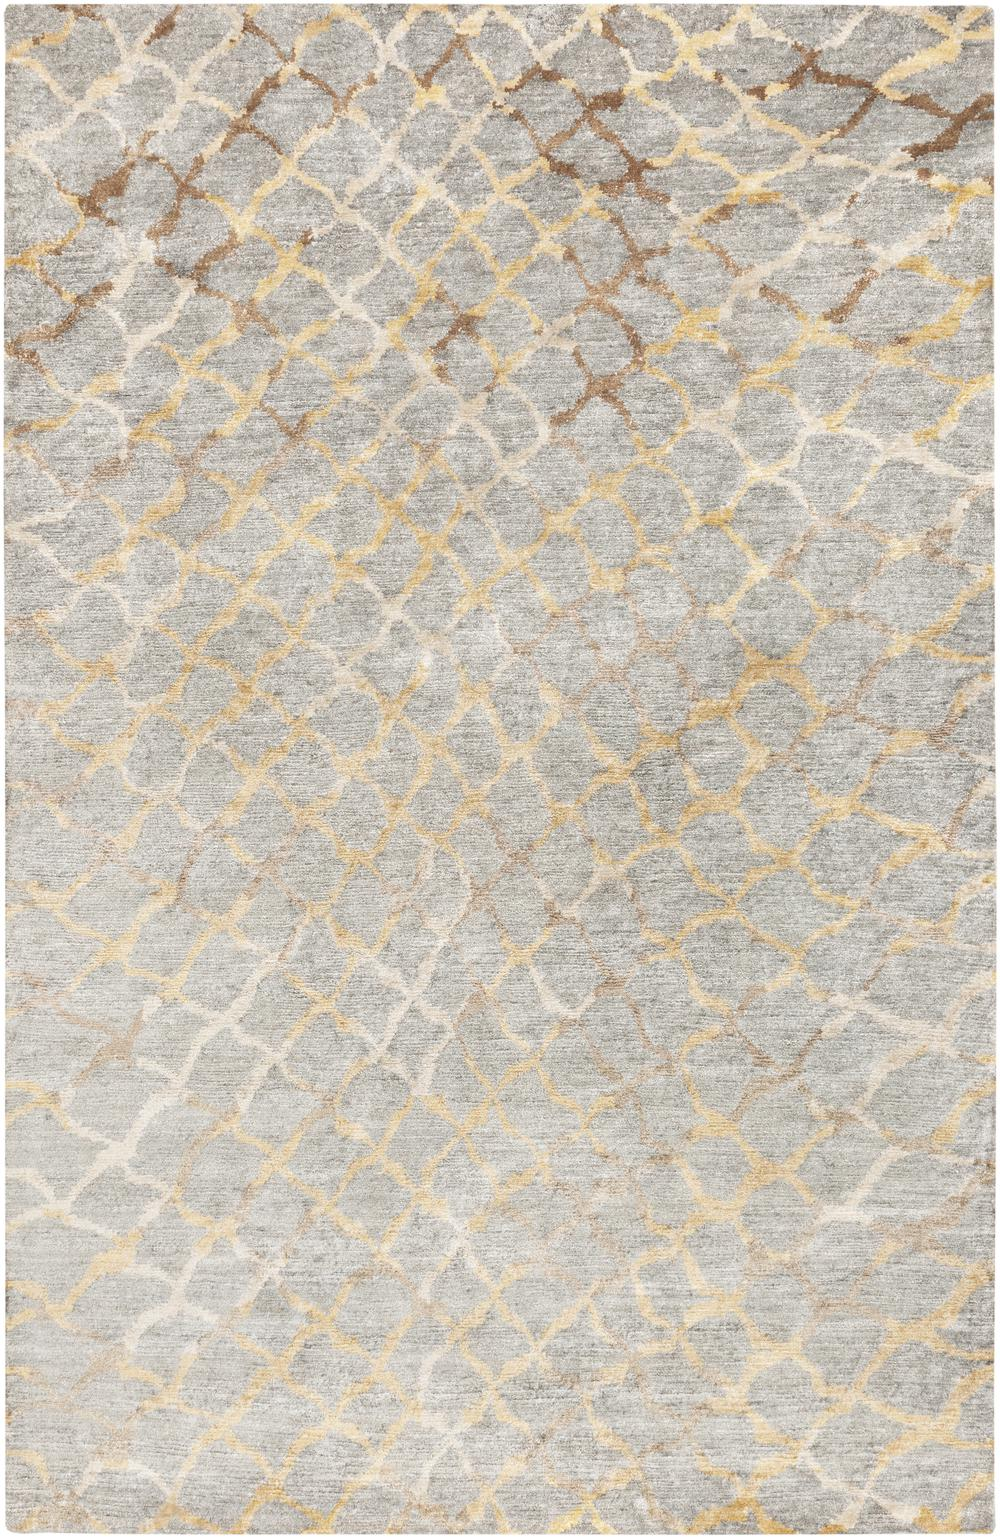 Surya Platinum Plat9018 Grey Area Rug Free Shipping